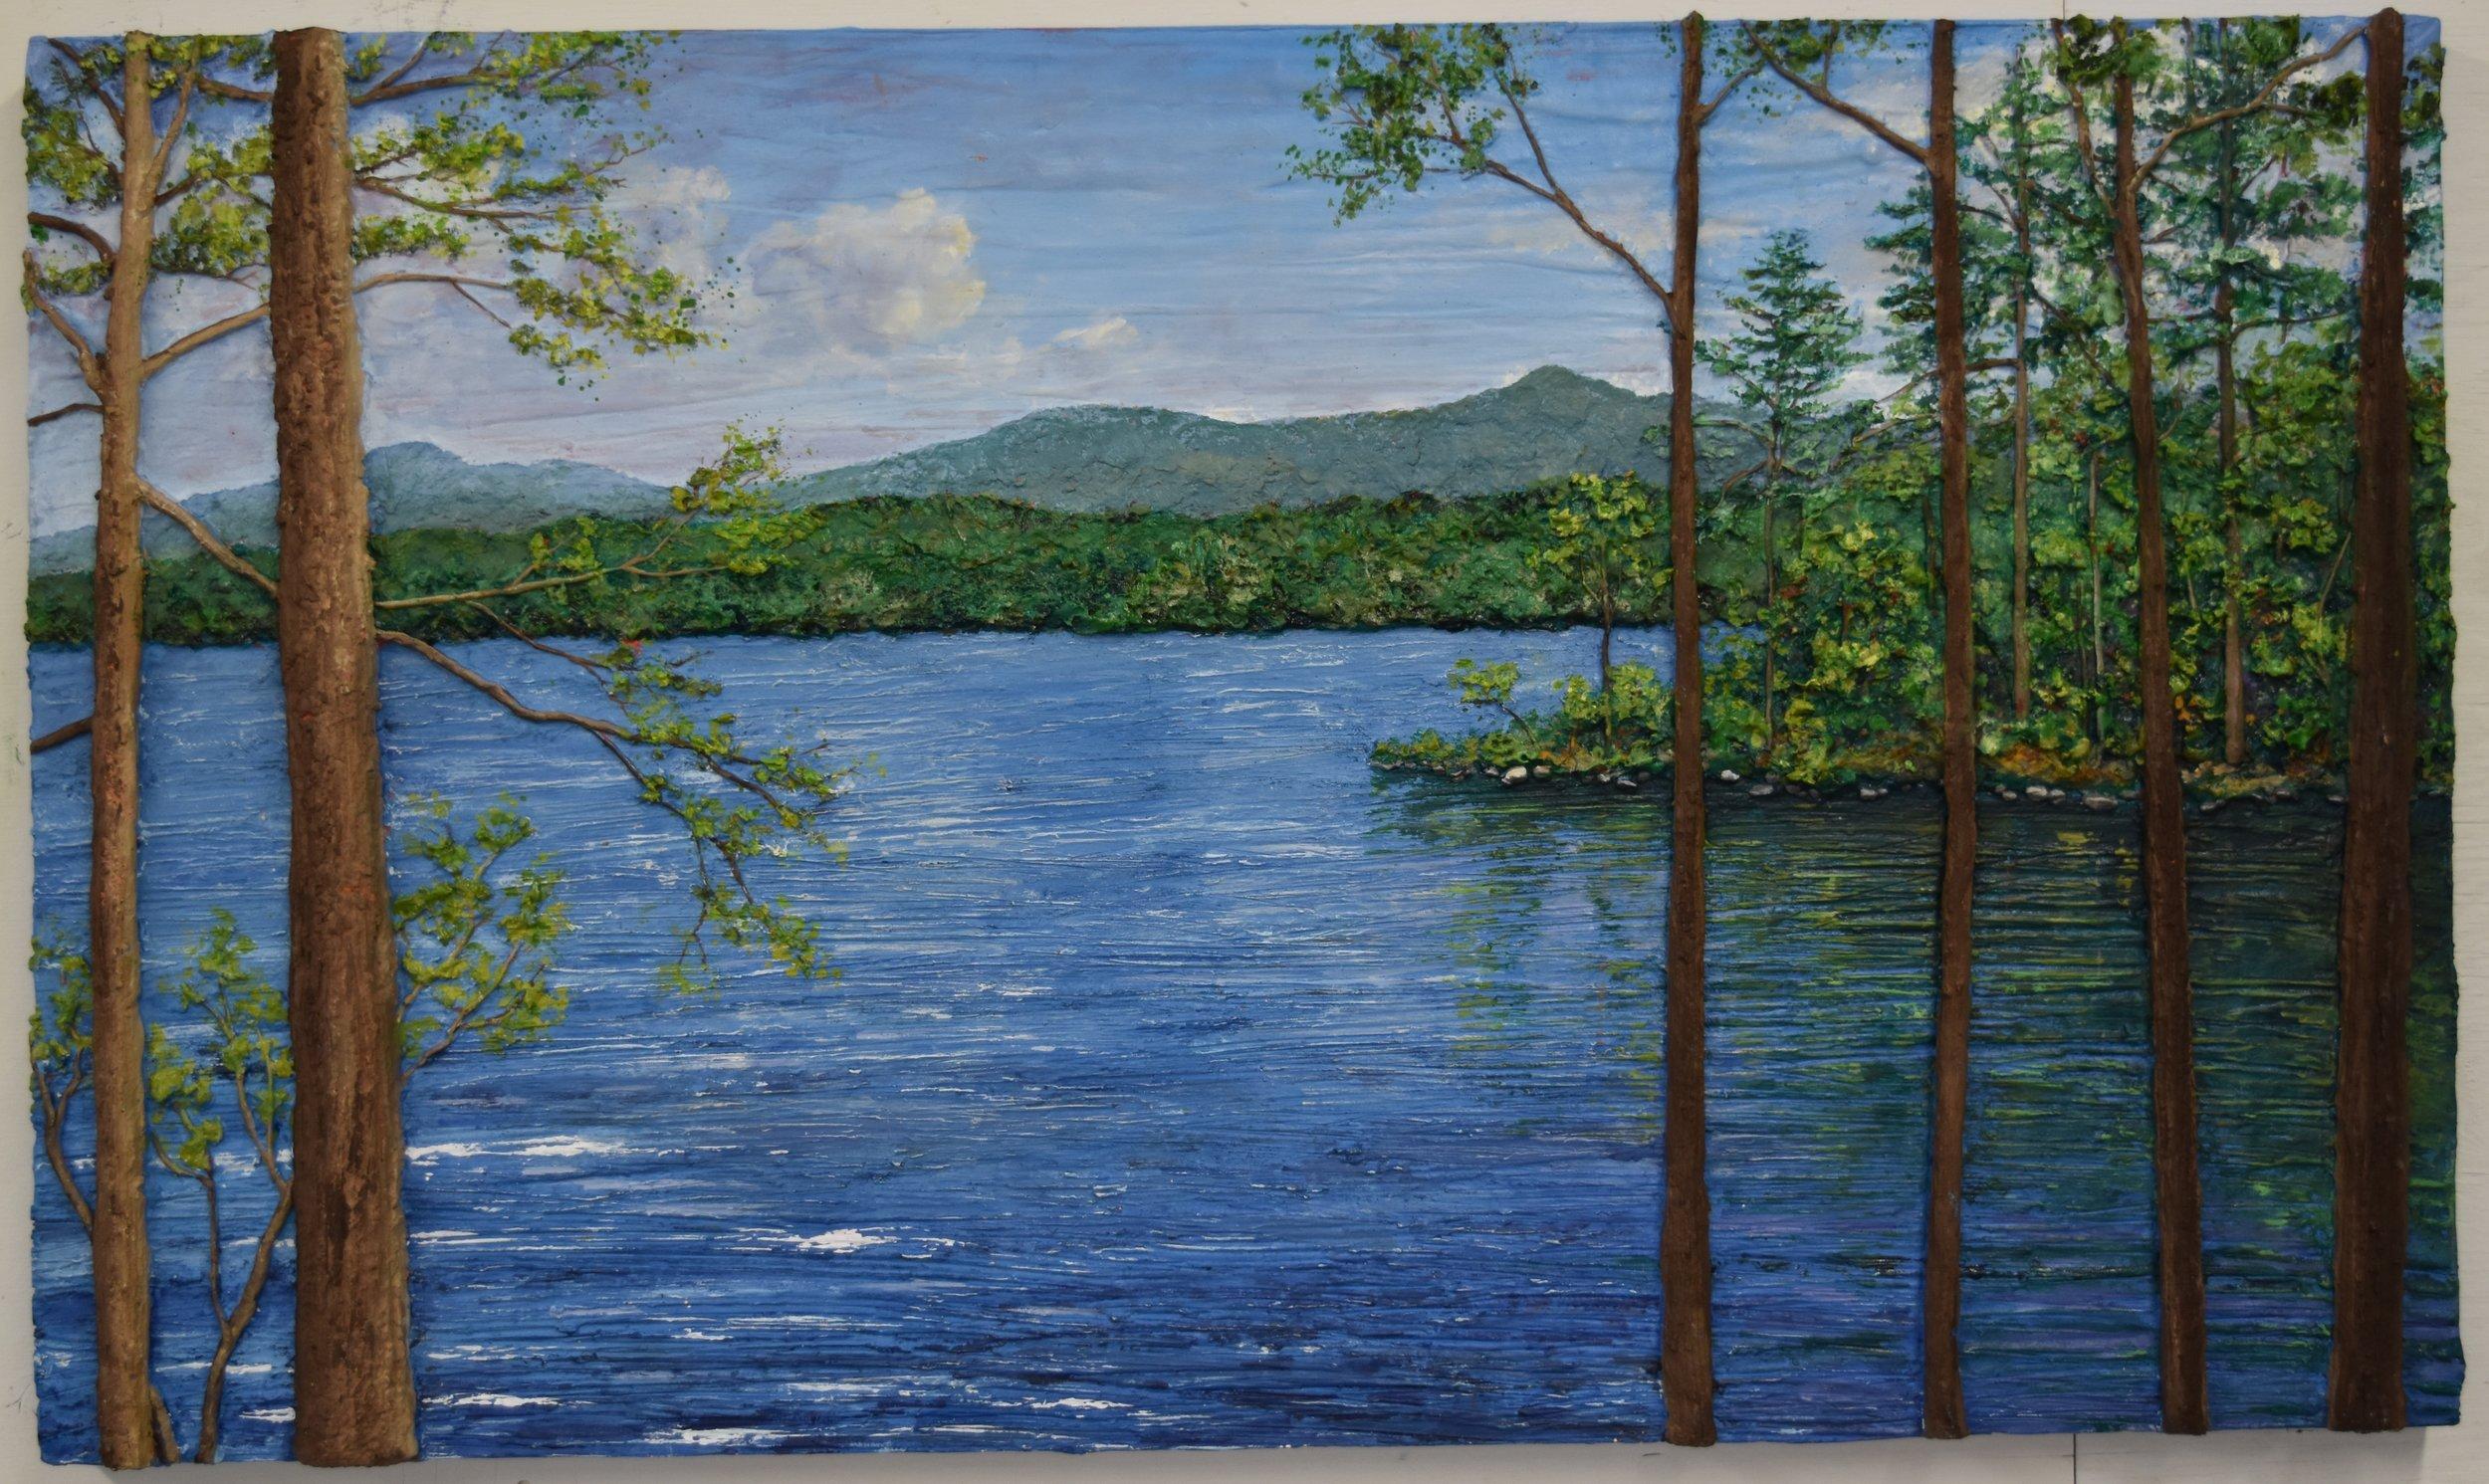 Lake Winnepausake